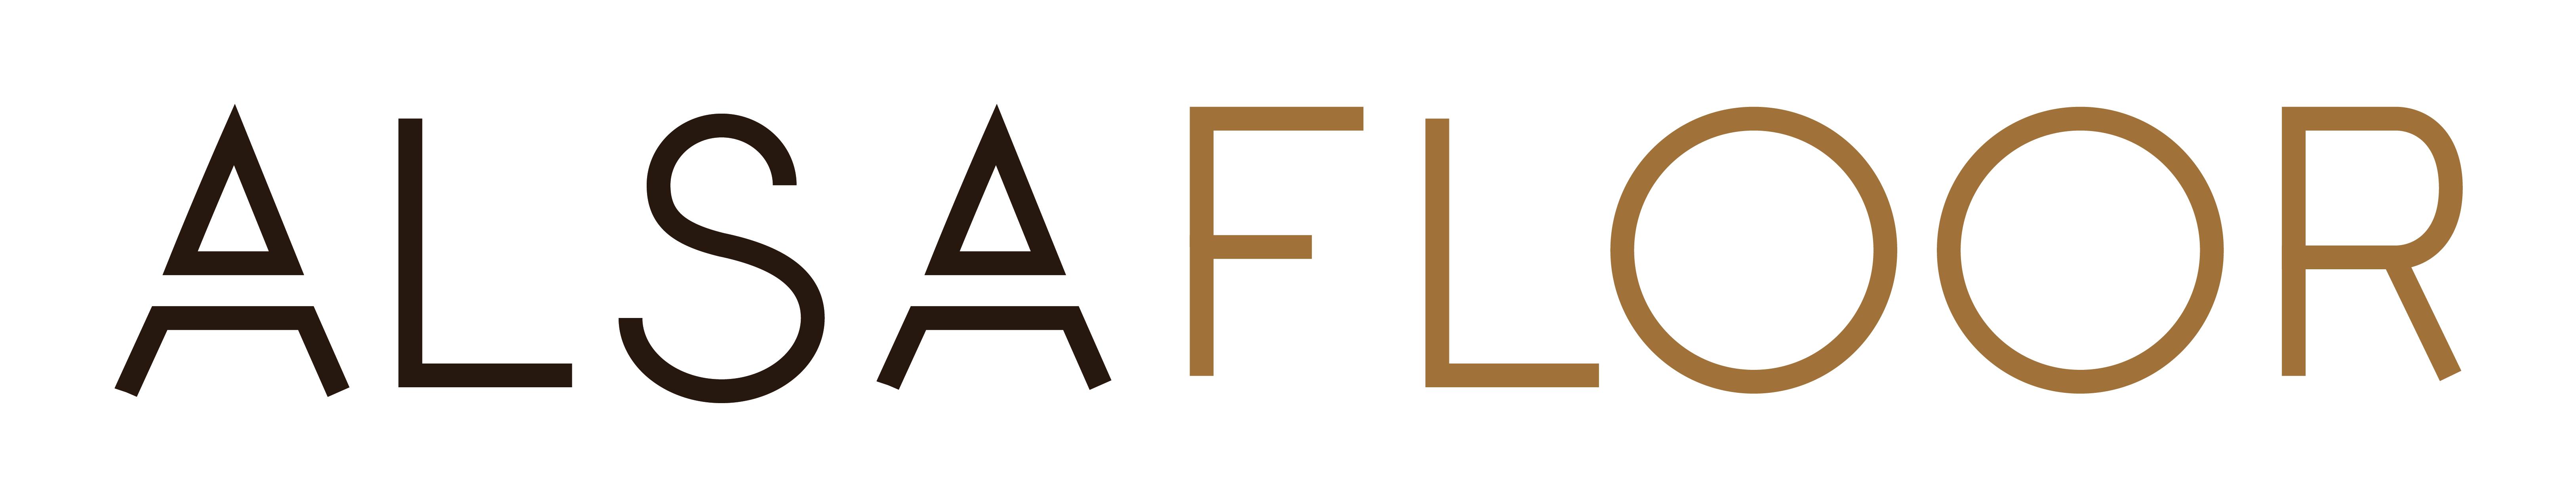 logo_alsafloor_2018 vf